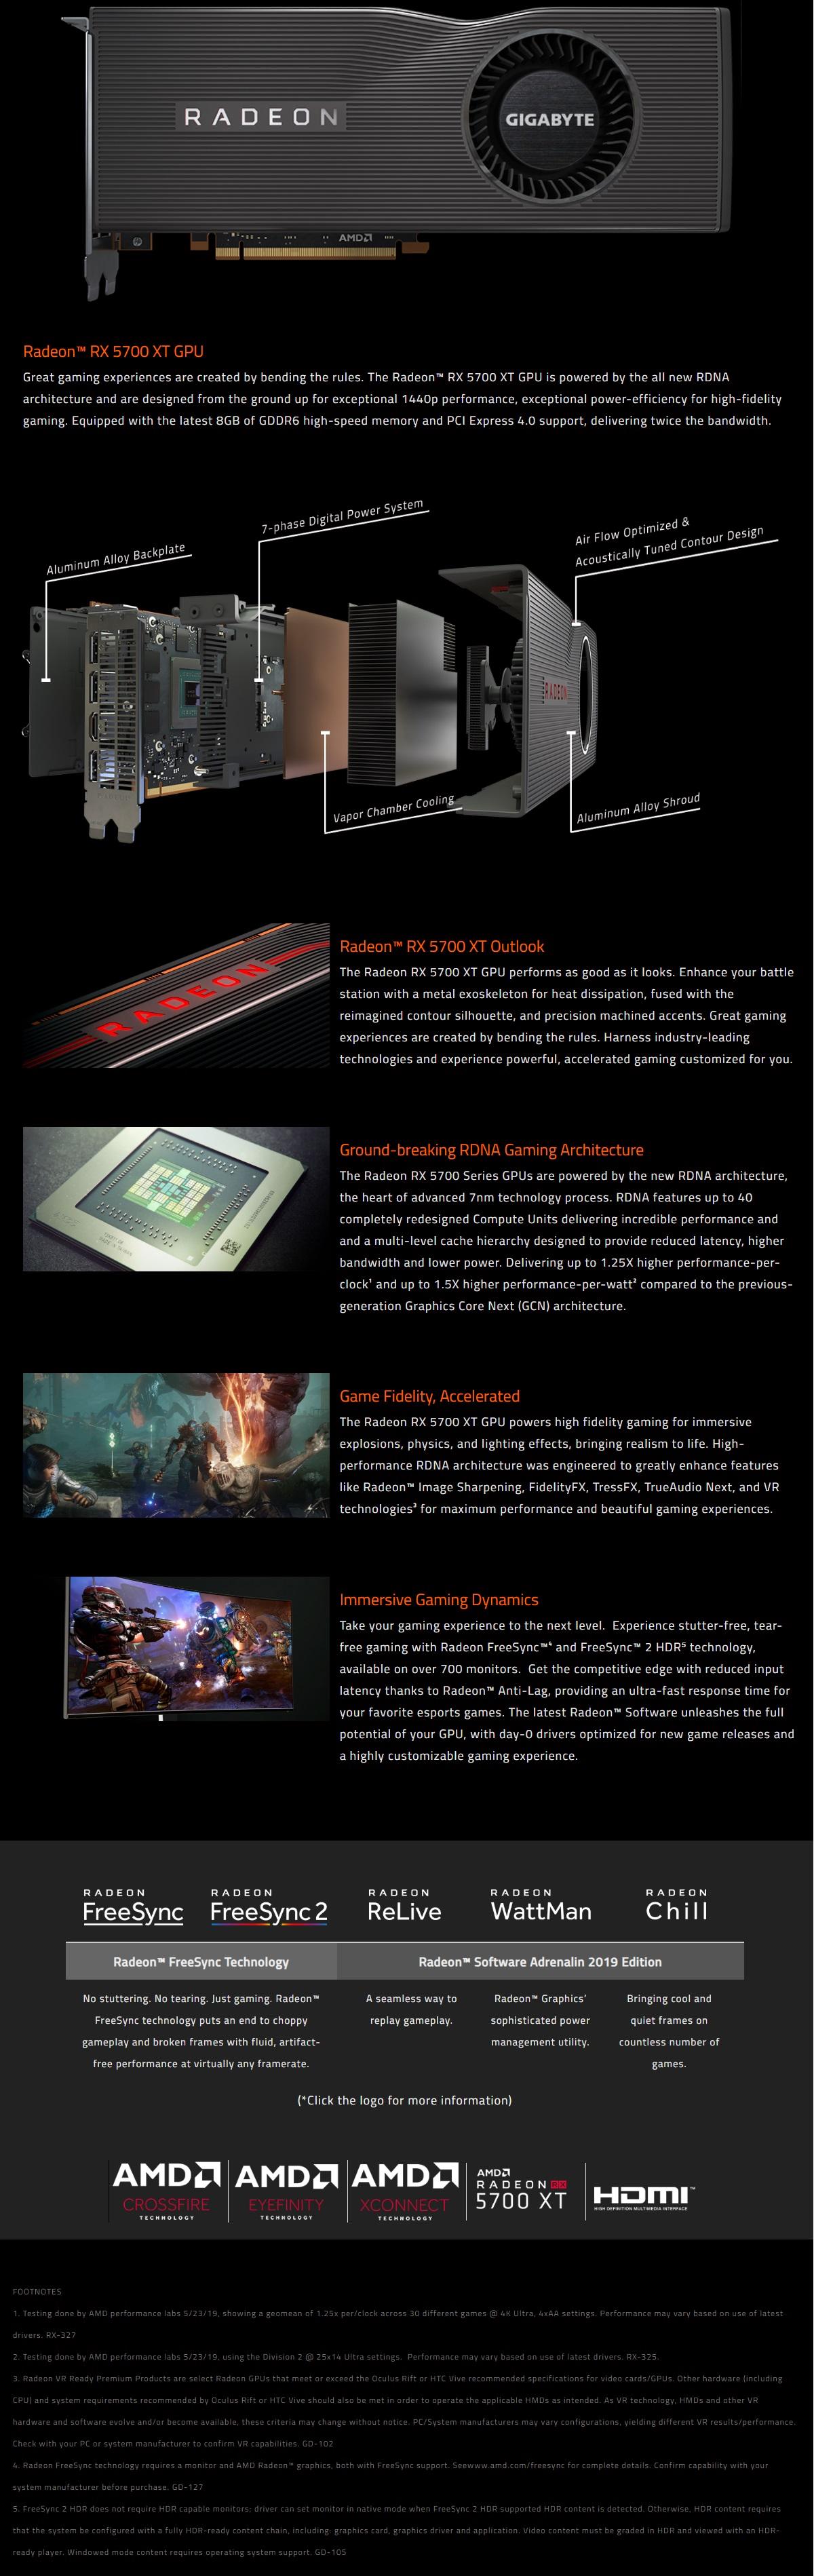 Gigabyte Radeon RX 5700 XT 8G Gaming Graphics Card